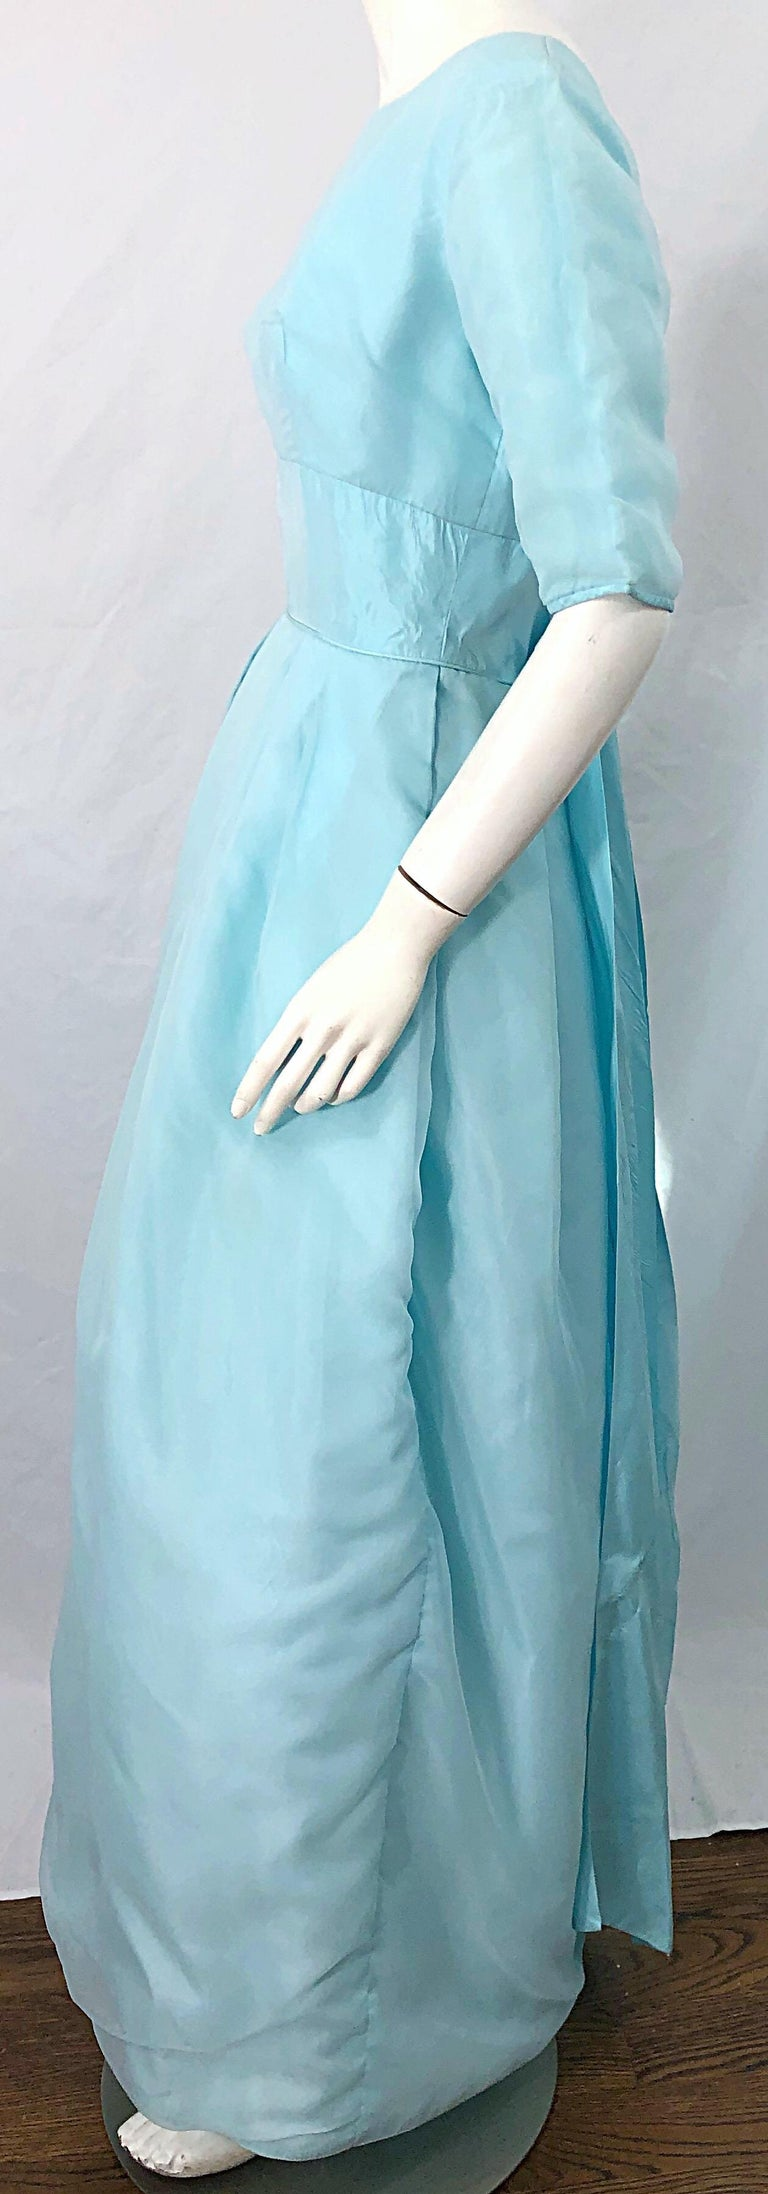 1950s Demi Couture Light Blue Cinderella Silk Chiffon Taffeta 3/4 Sleeves Gown For Sale 4